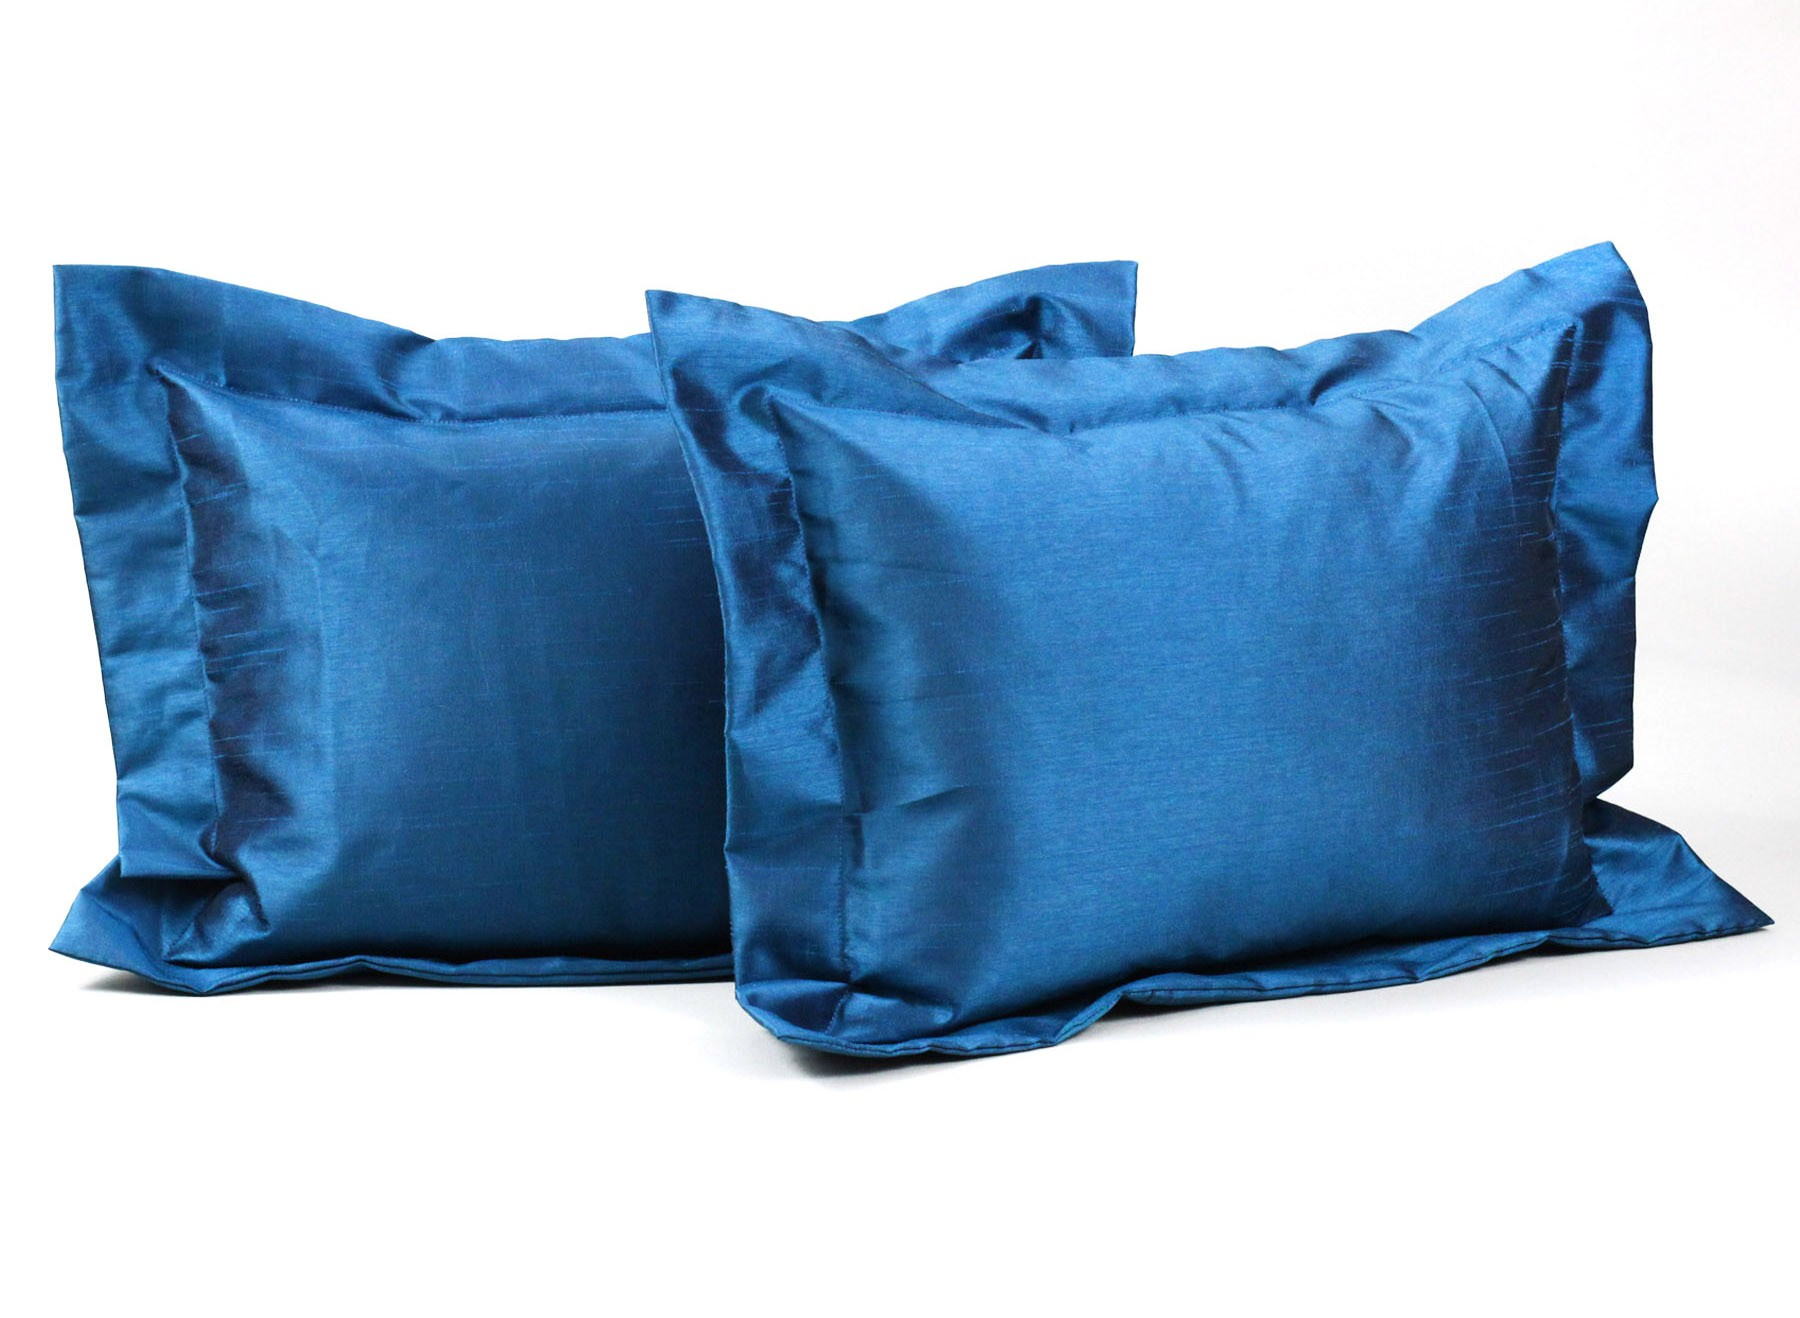 Aromatherapy Pillow Pet : Poly Dupioni Rectangular Aromatherapy Pillow - 12x 16